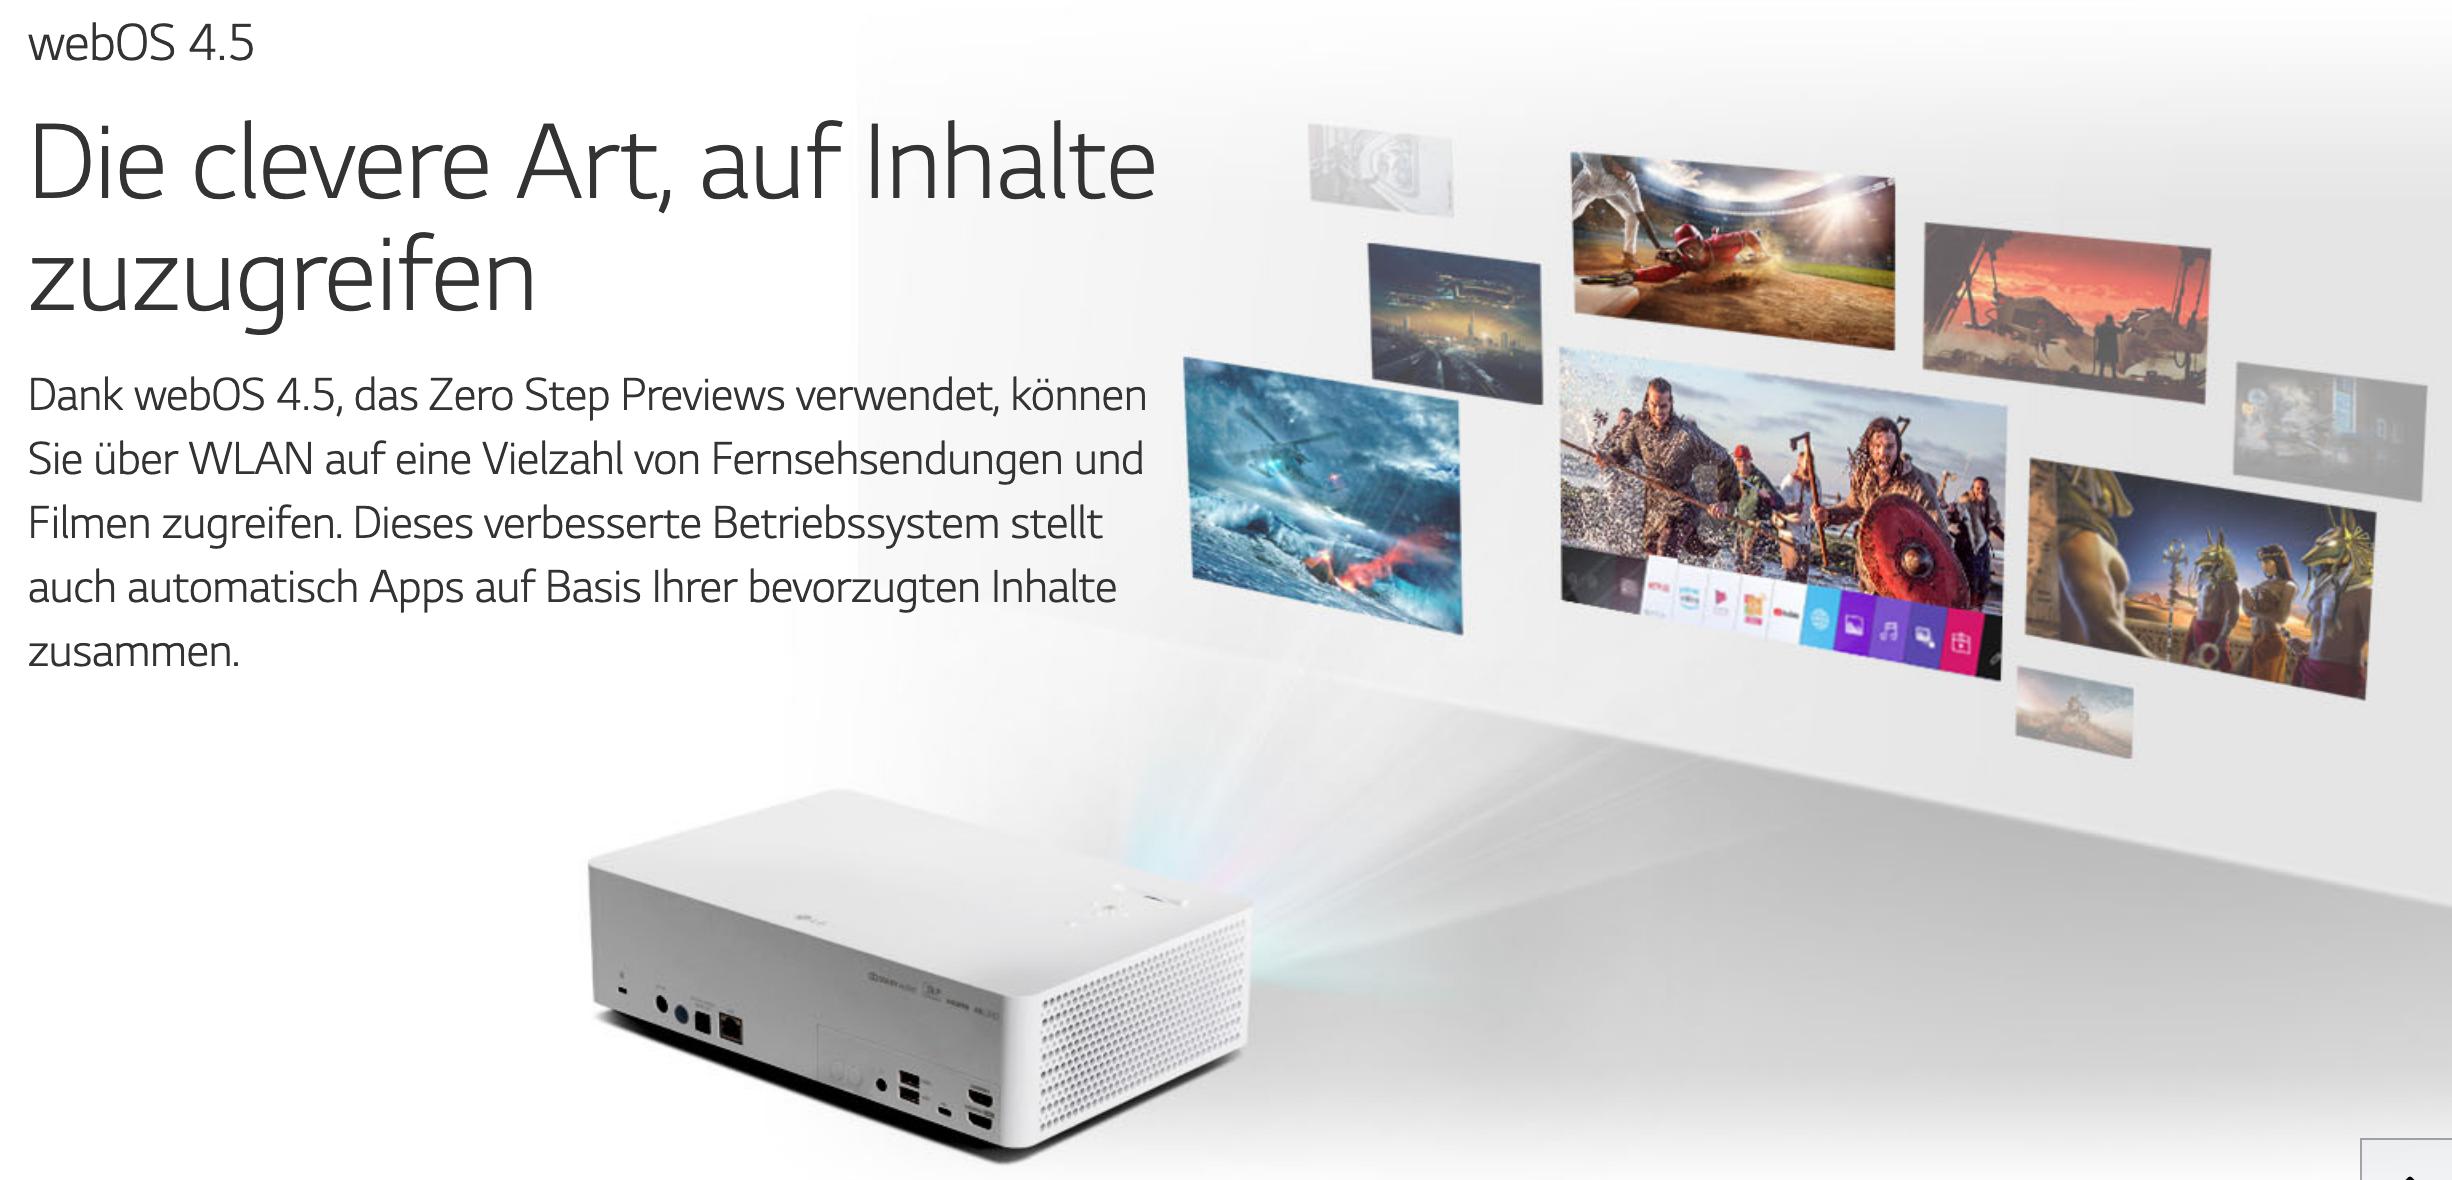 Screenshot_2020-01-13-LG-CineBeam-HU70LS-Largo-4K-LG-Deutschland-4